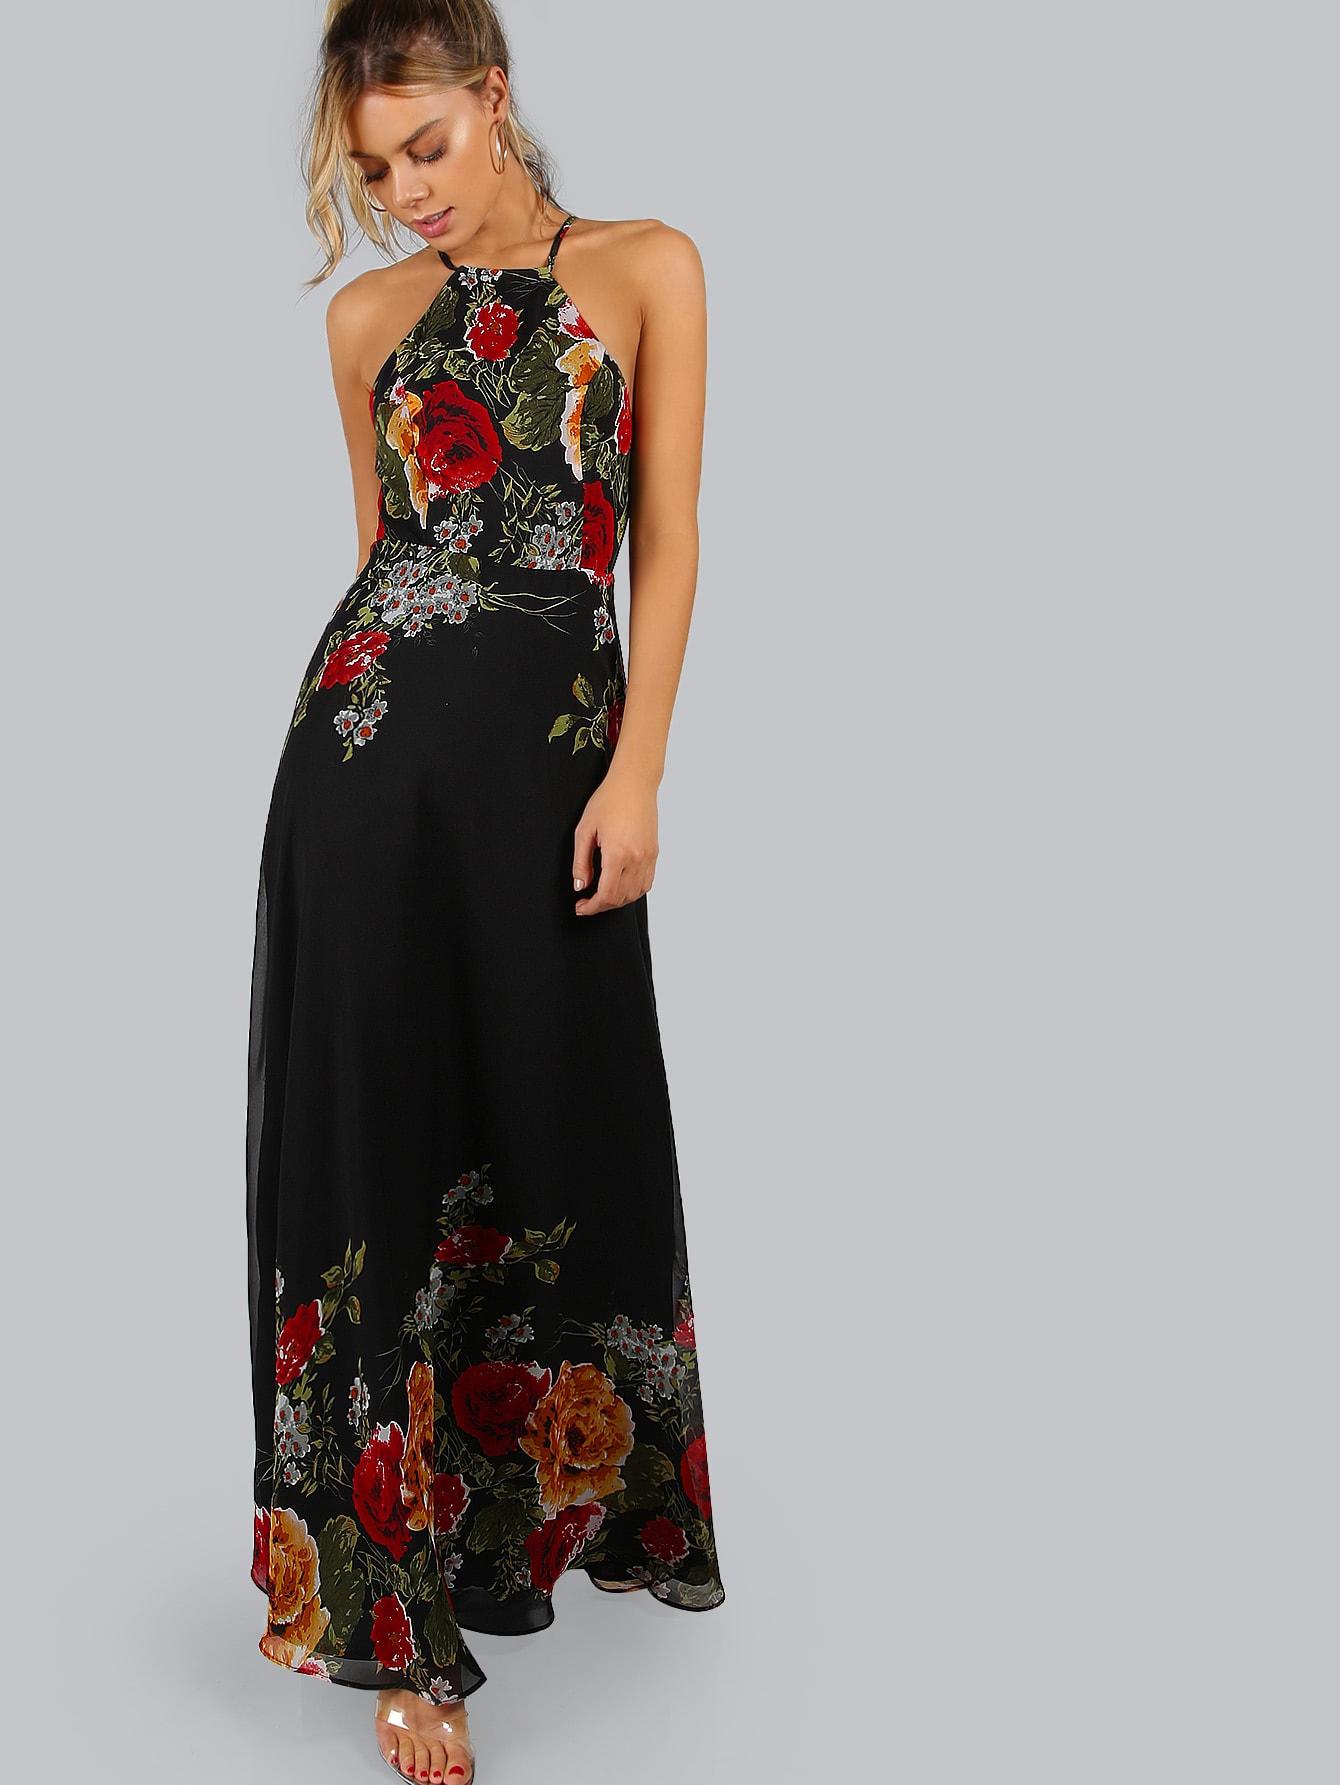 Black Flower Print Halter Neck Open Back Maxi Dress Shein